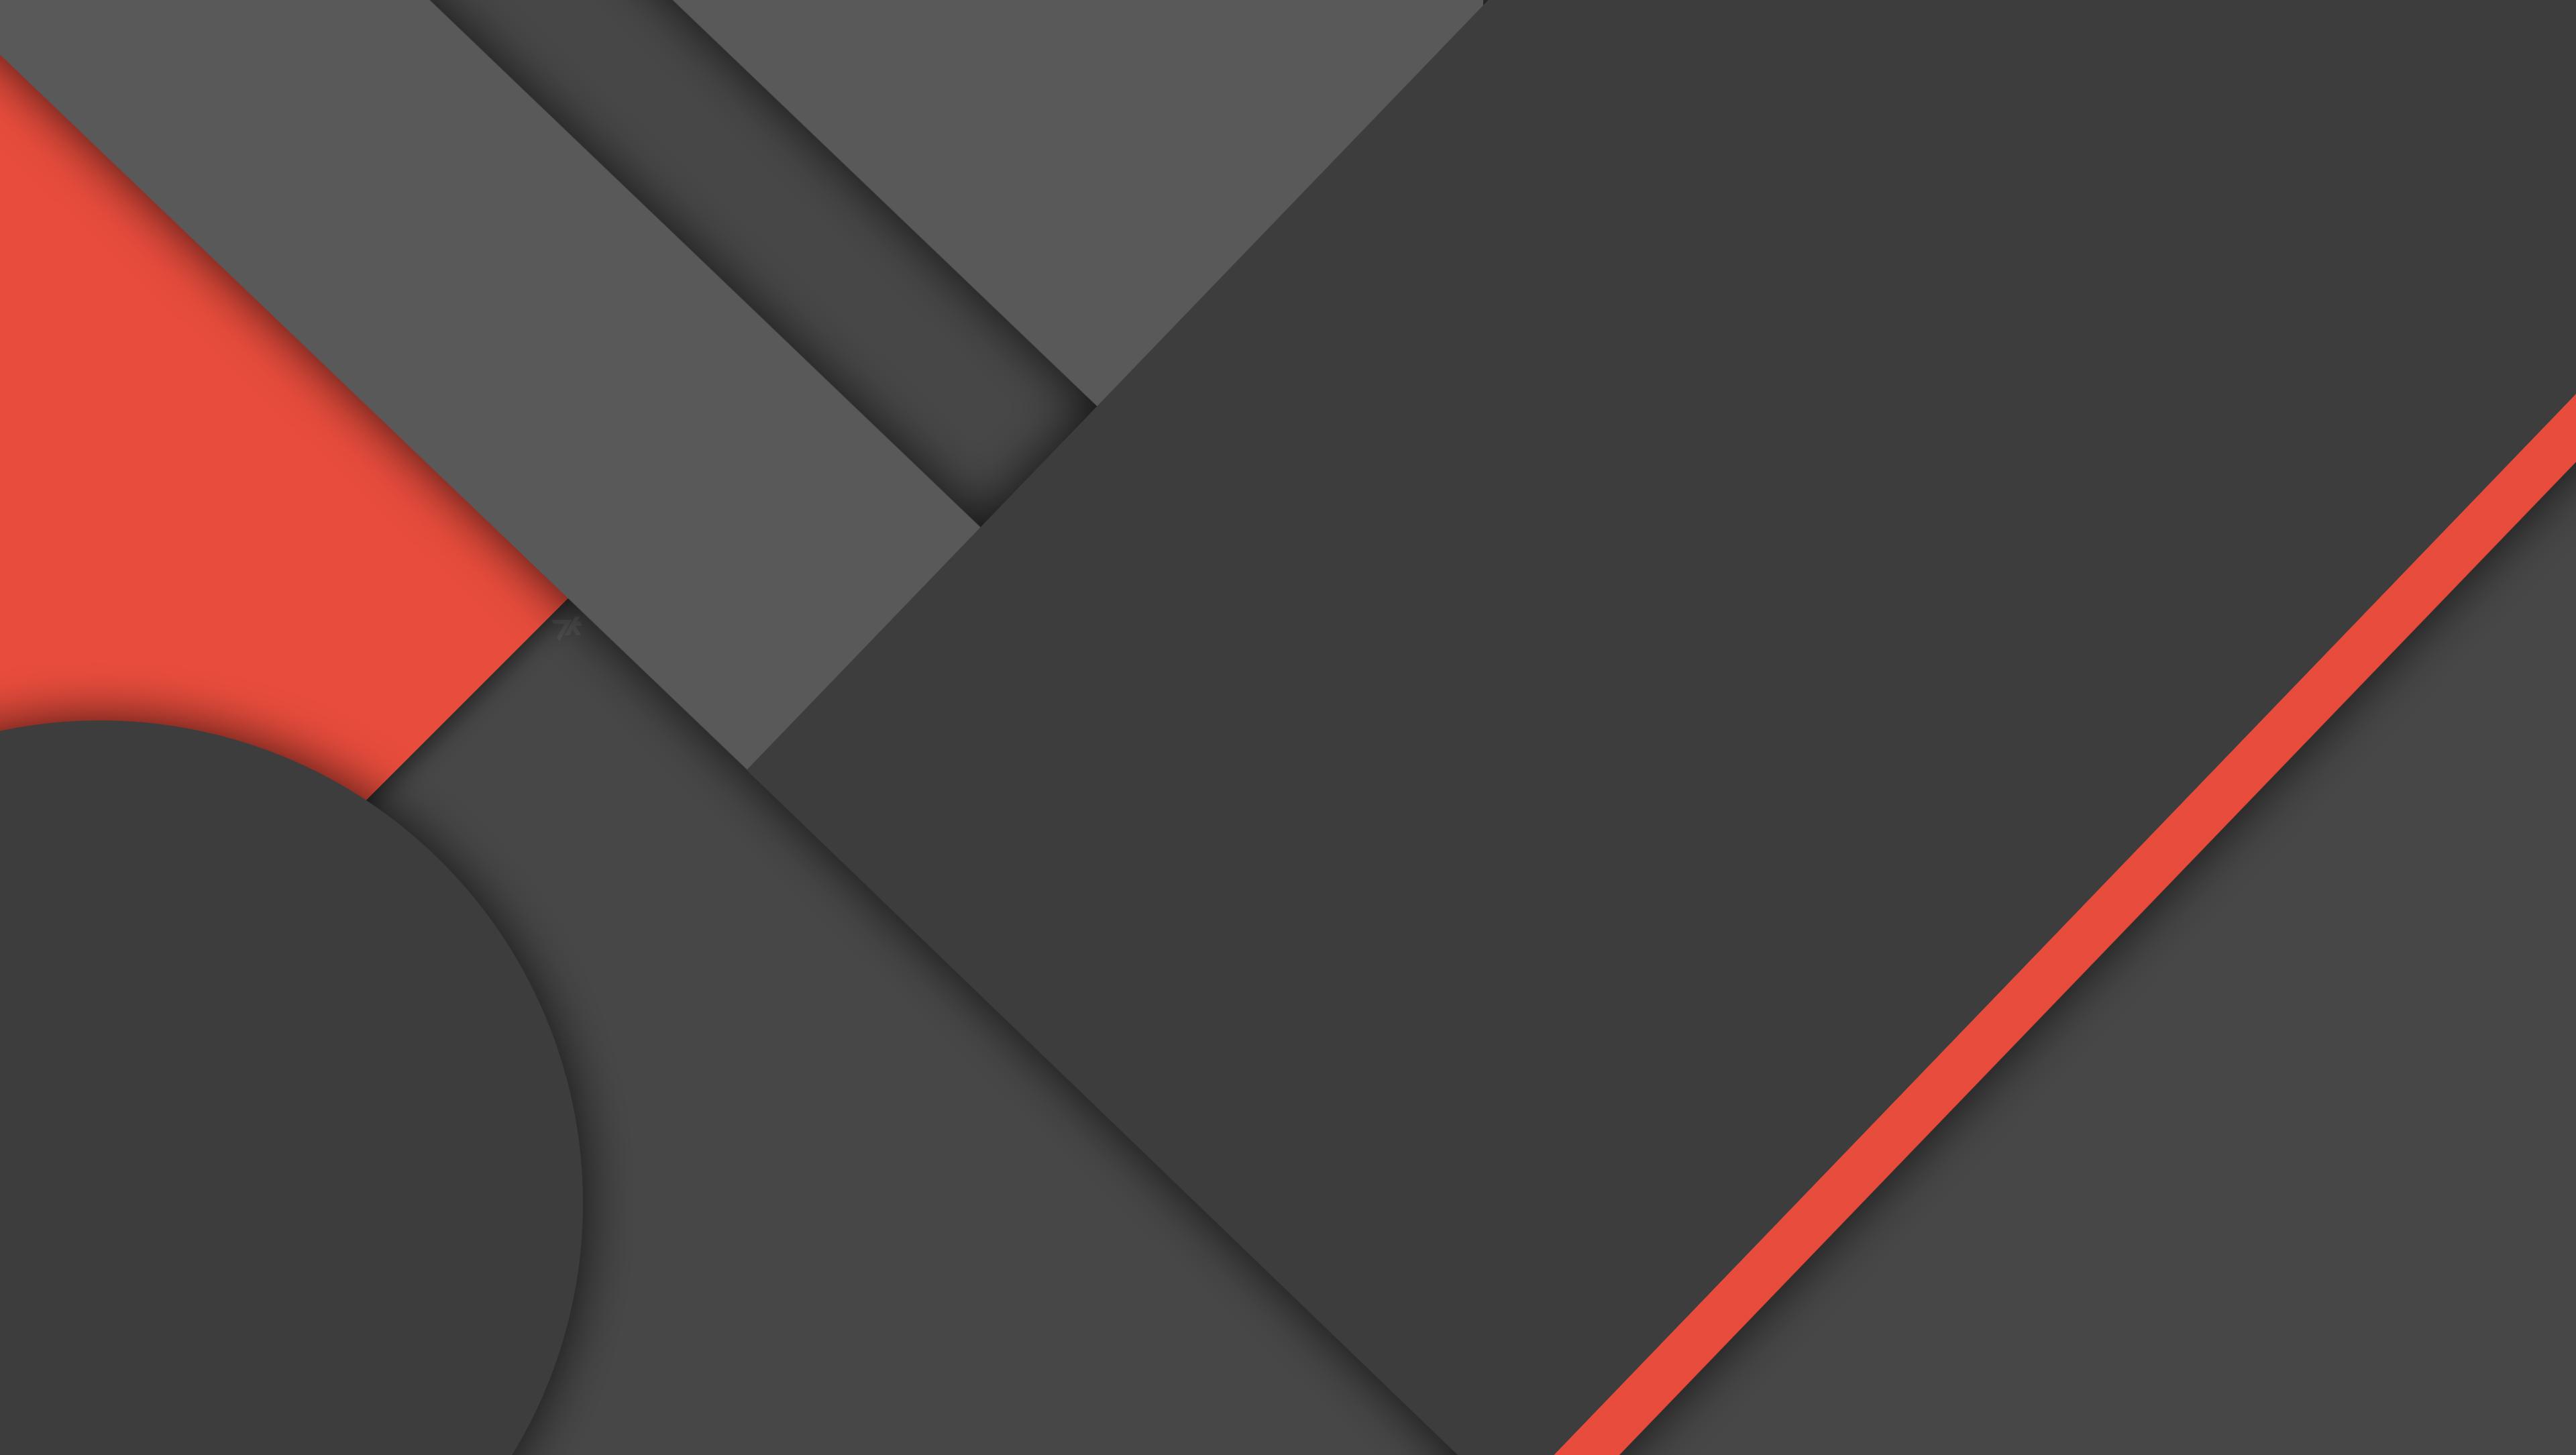 MinFlat] Dark Material Design Wallpaper 4K by DaKoder 3840x2169